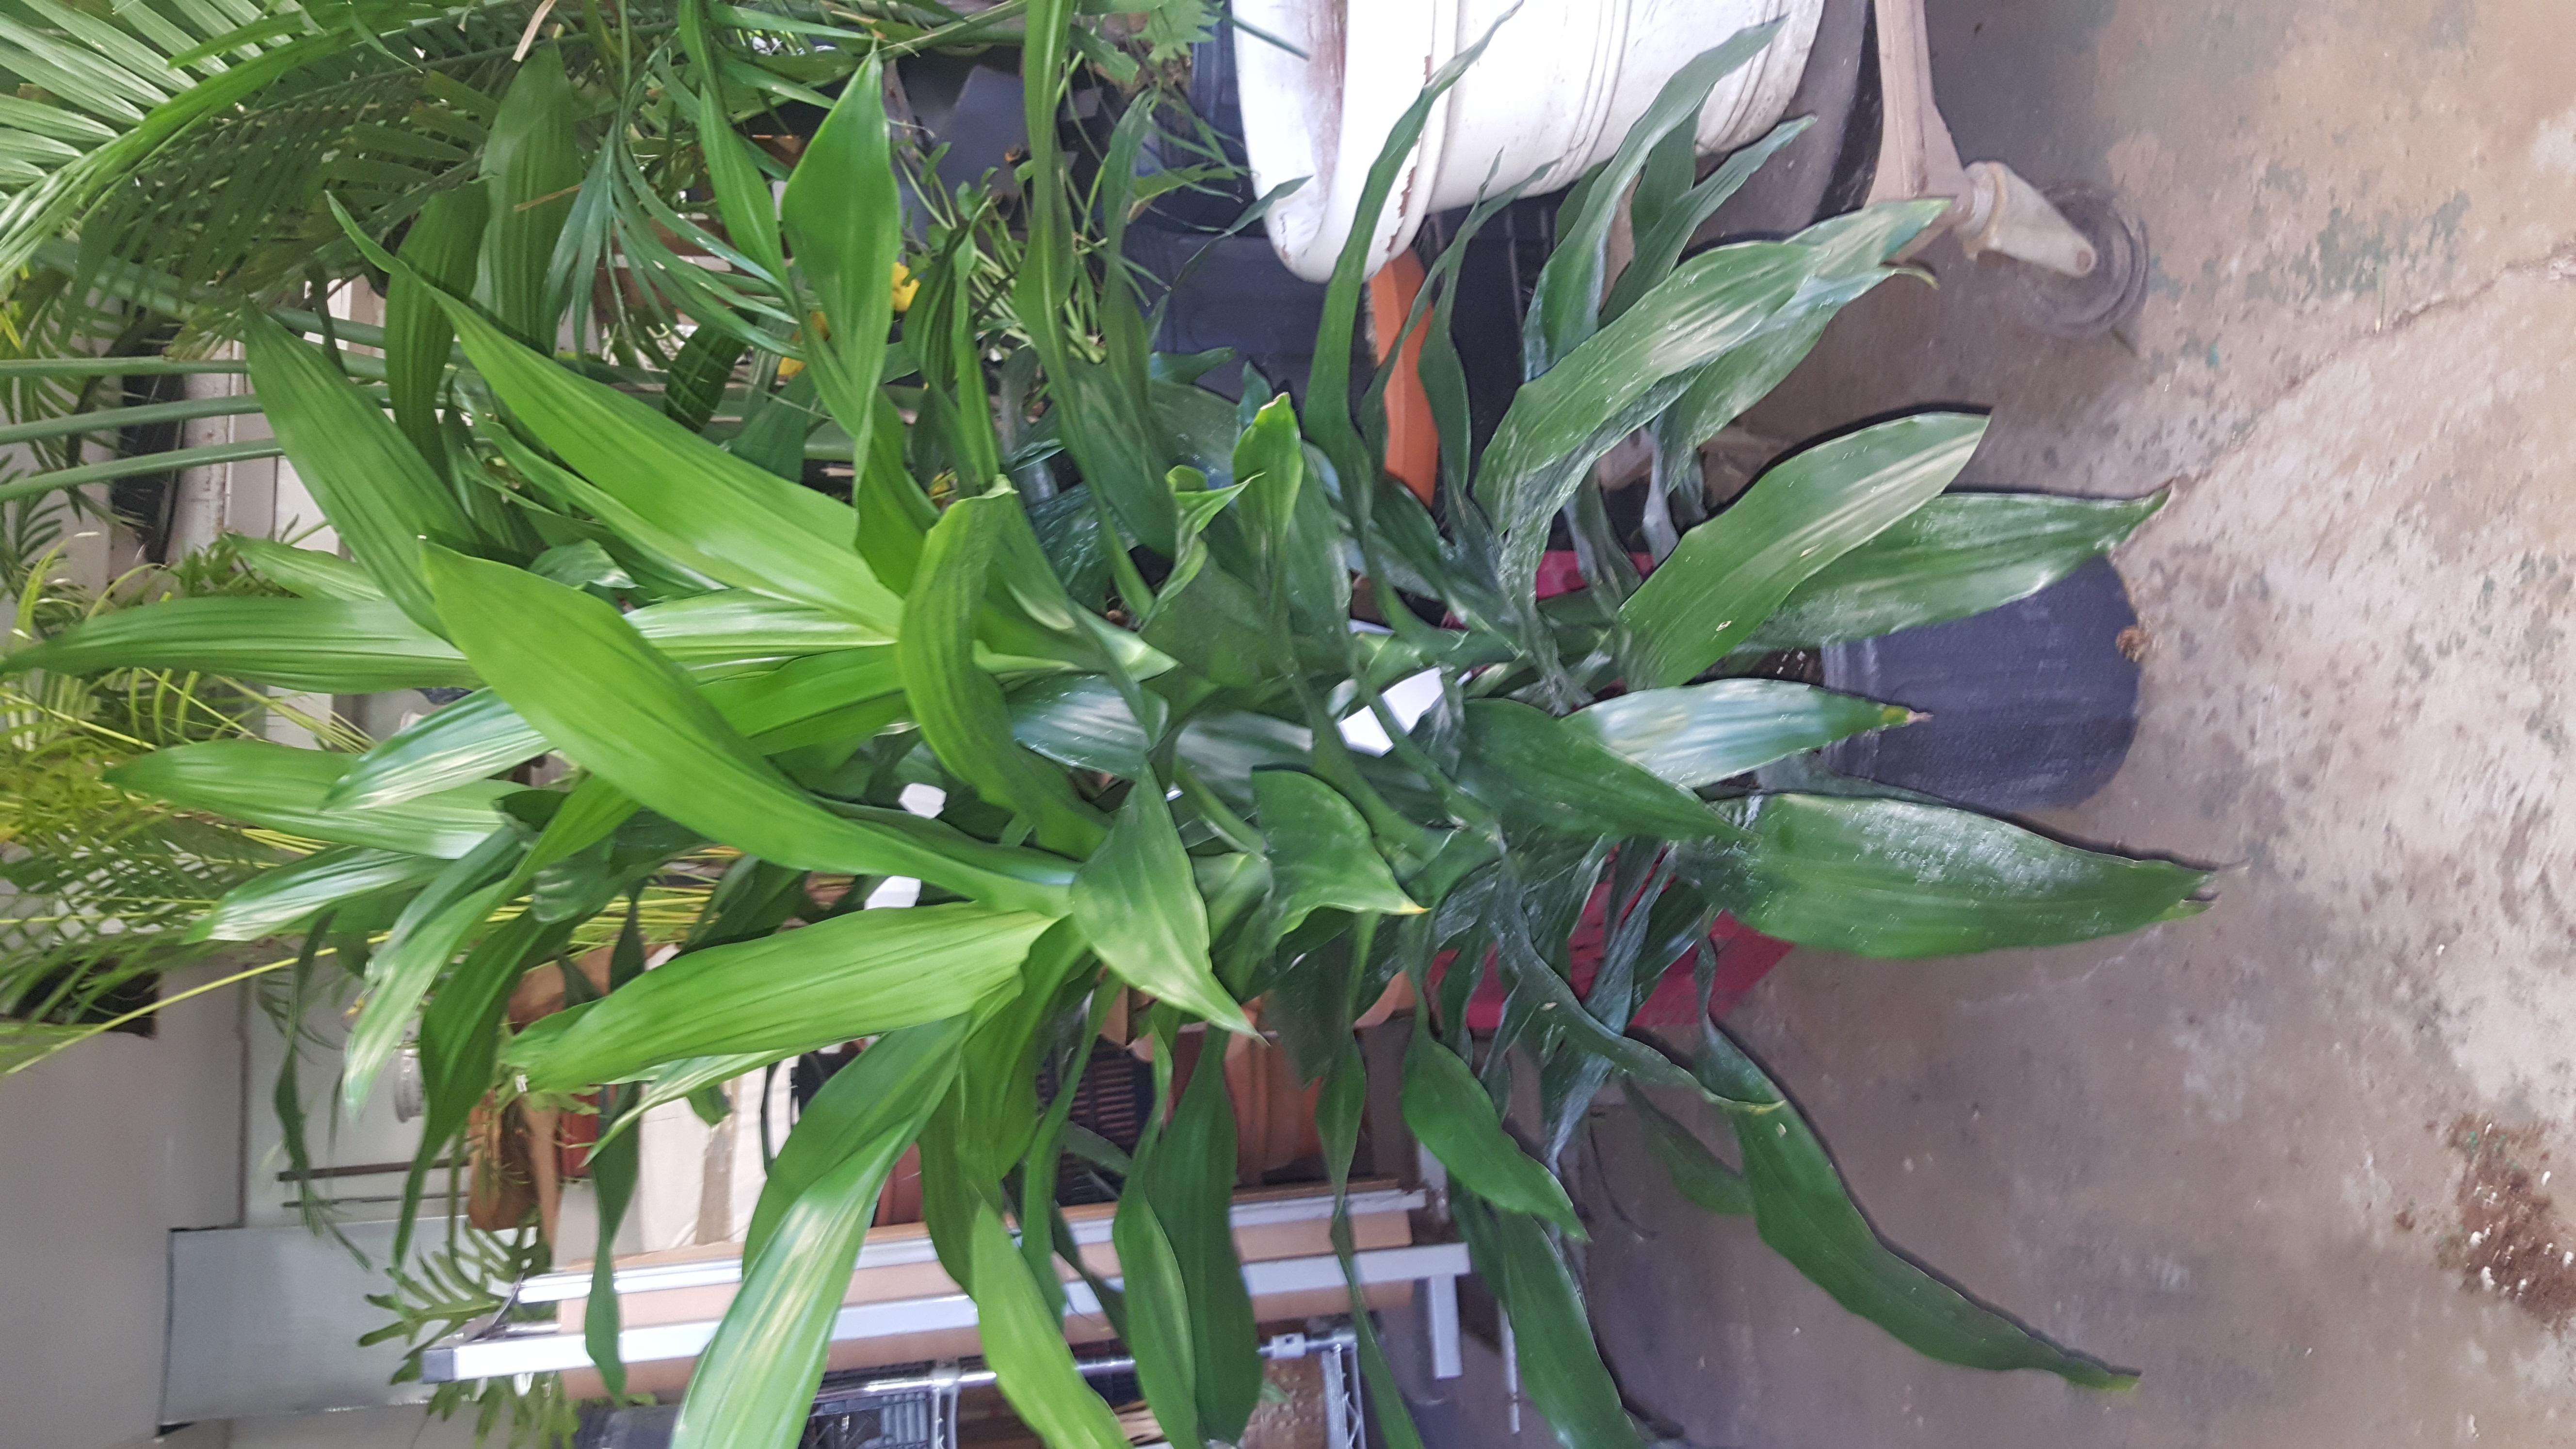 green dracena bush